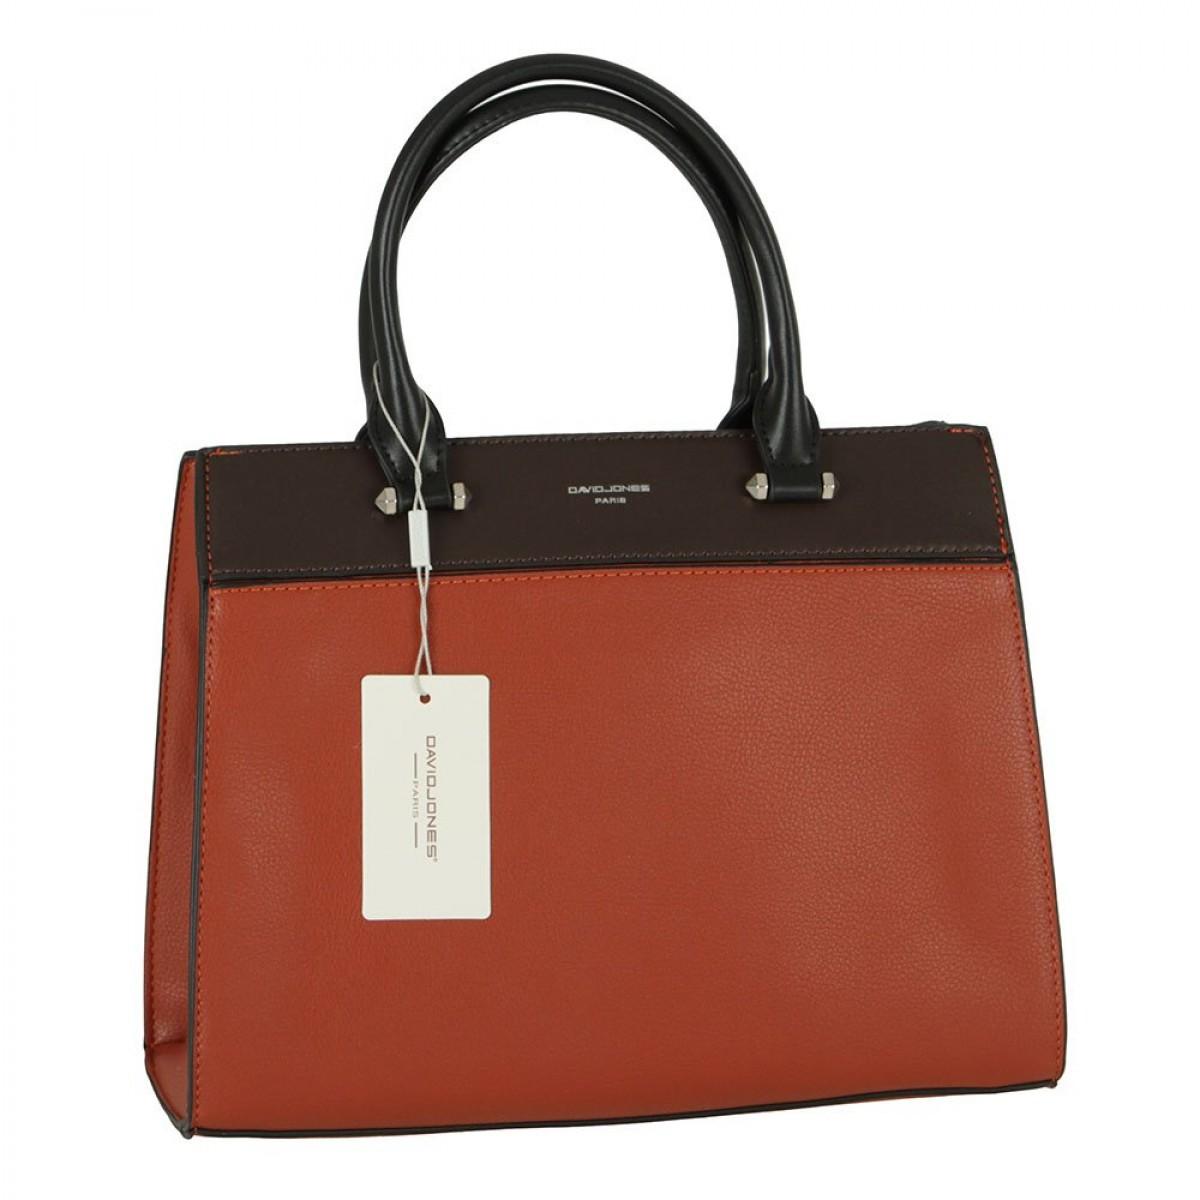 Жіноча сумка David Jones 6413-2 SIENNA